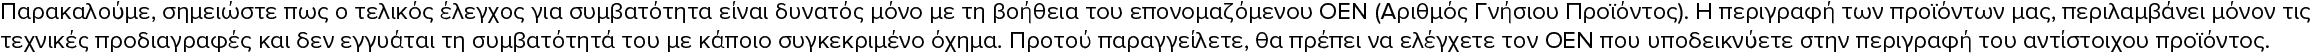 BERU 0002335940, 14 FR-7 DPPUS2, 92 702 93, 93 175 994, 82000-46337 Μπουζί